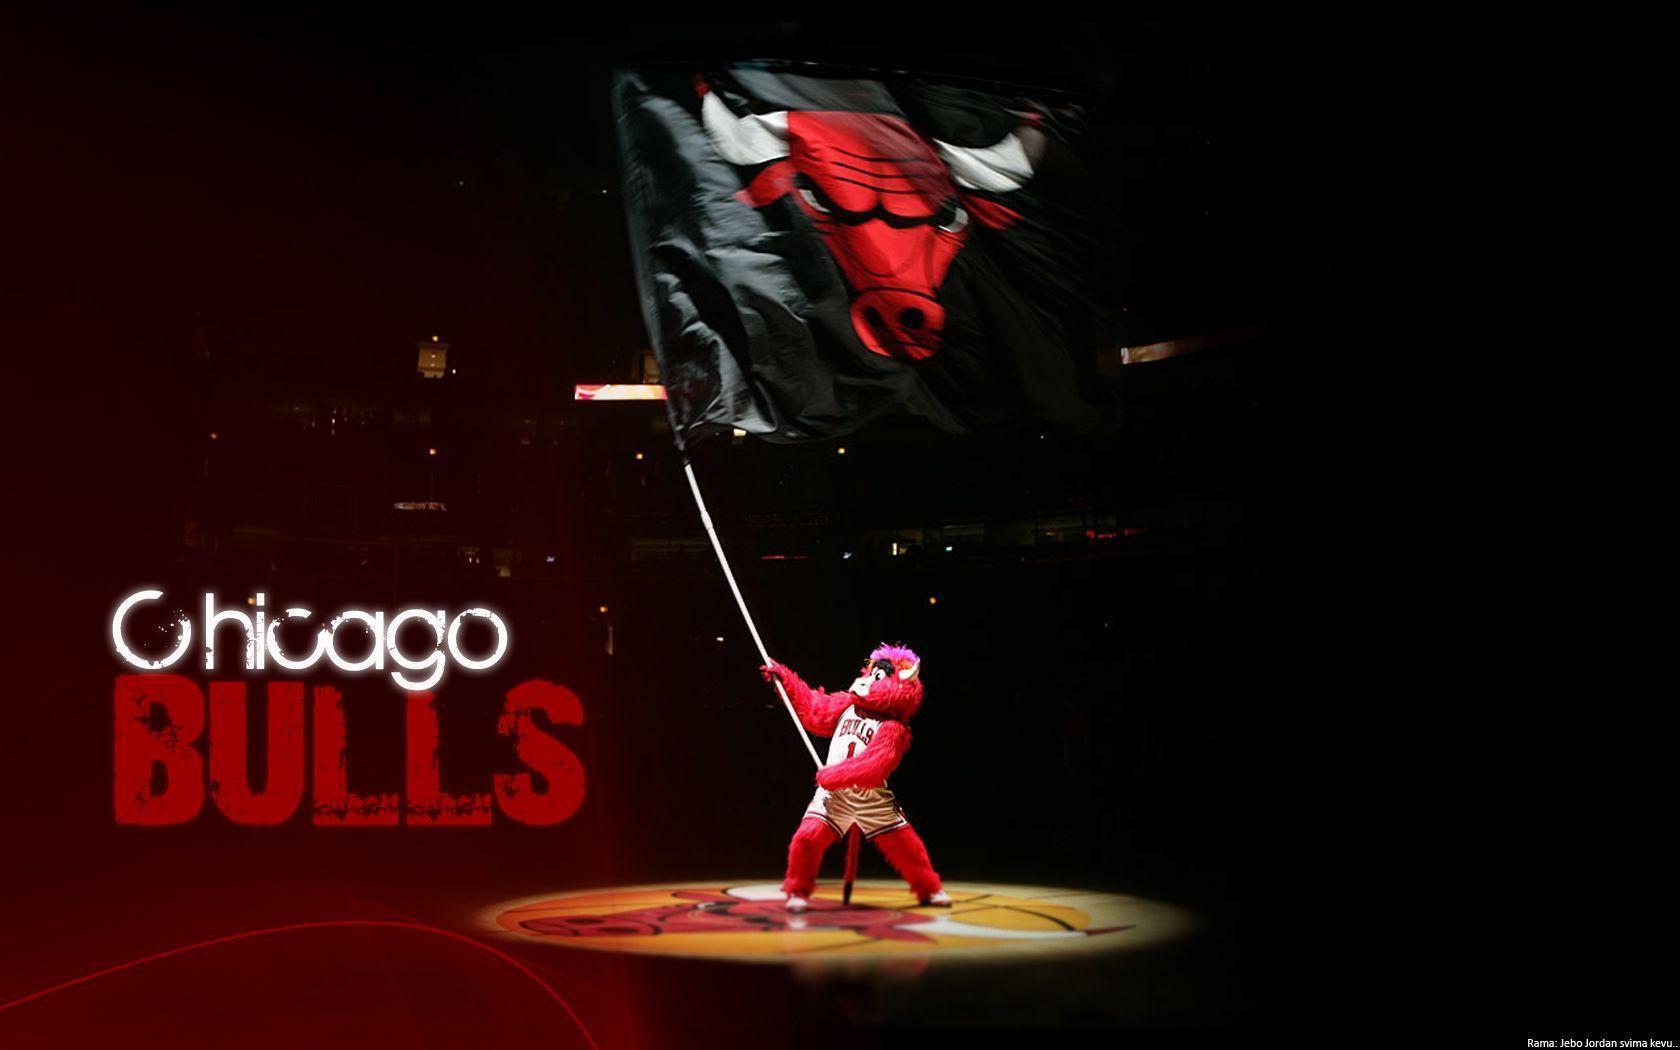 Chicago Bulls Wallpaper 55 Backgrounds | Wallruru.